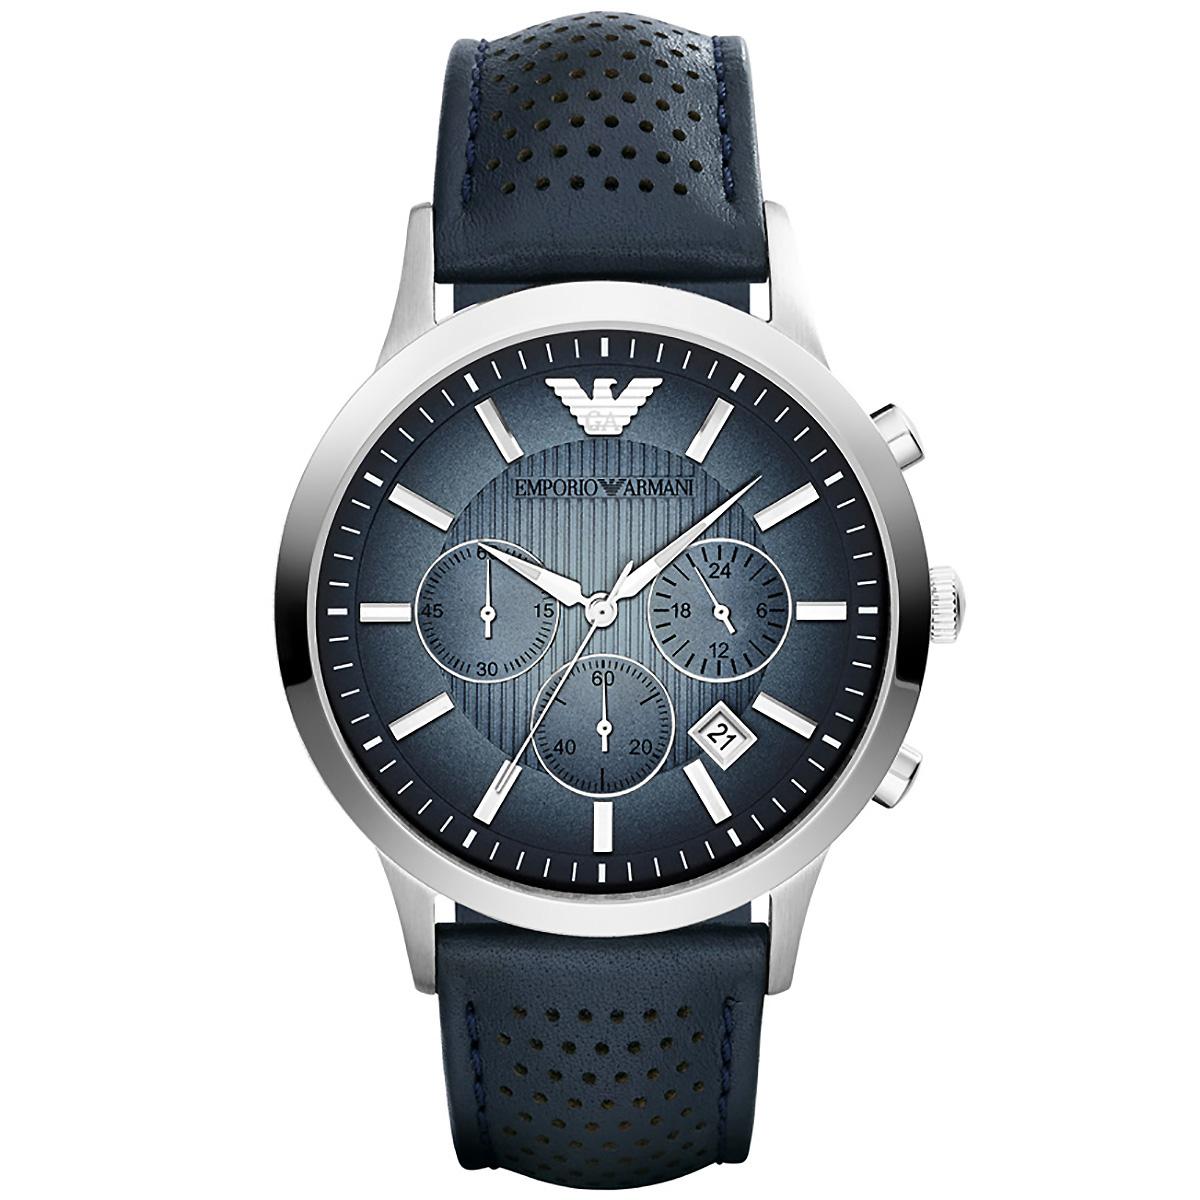 Herren Armbanduhr Leder Blau